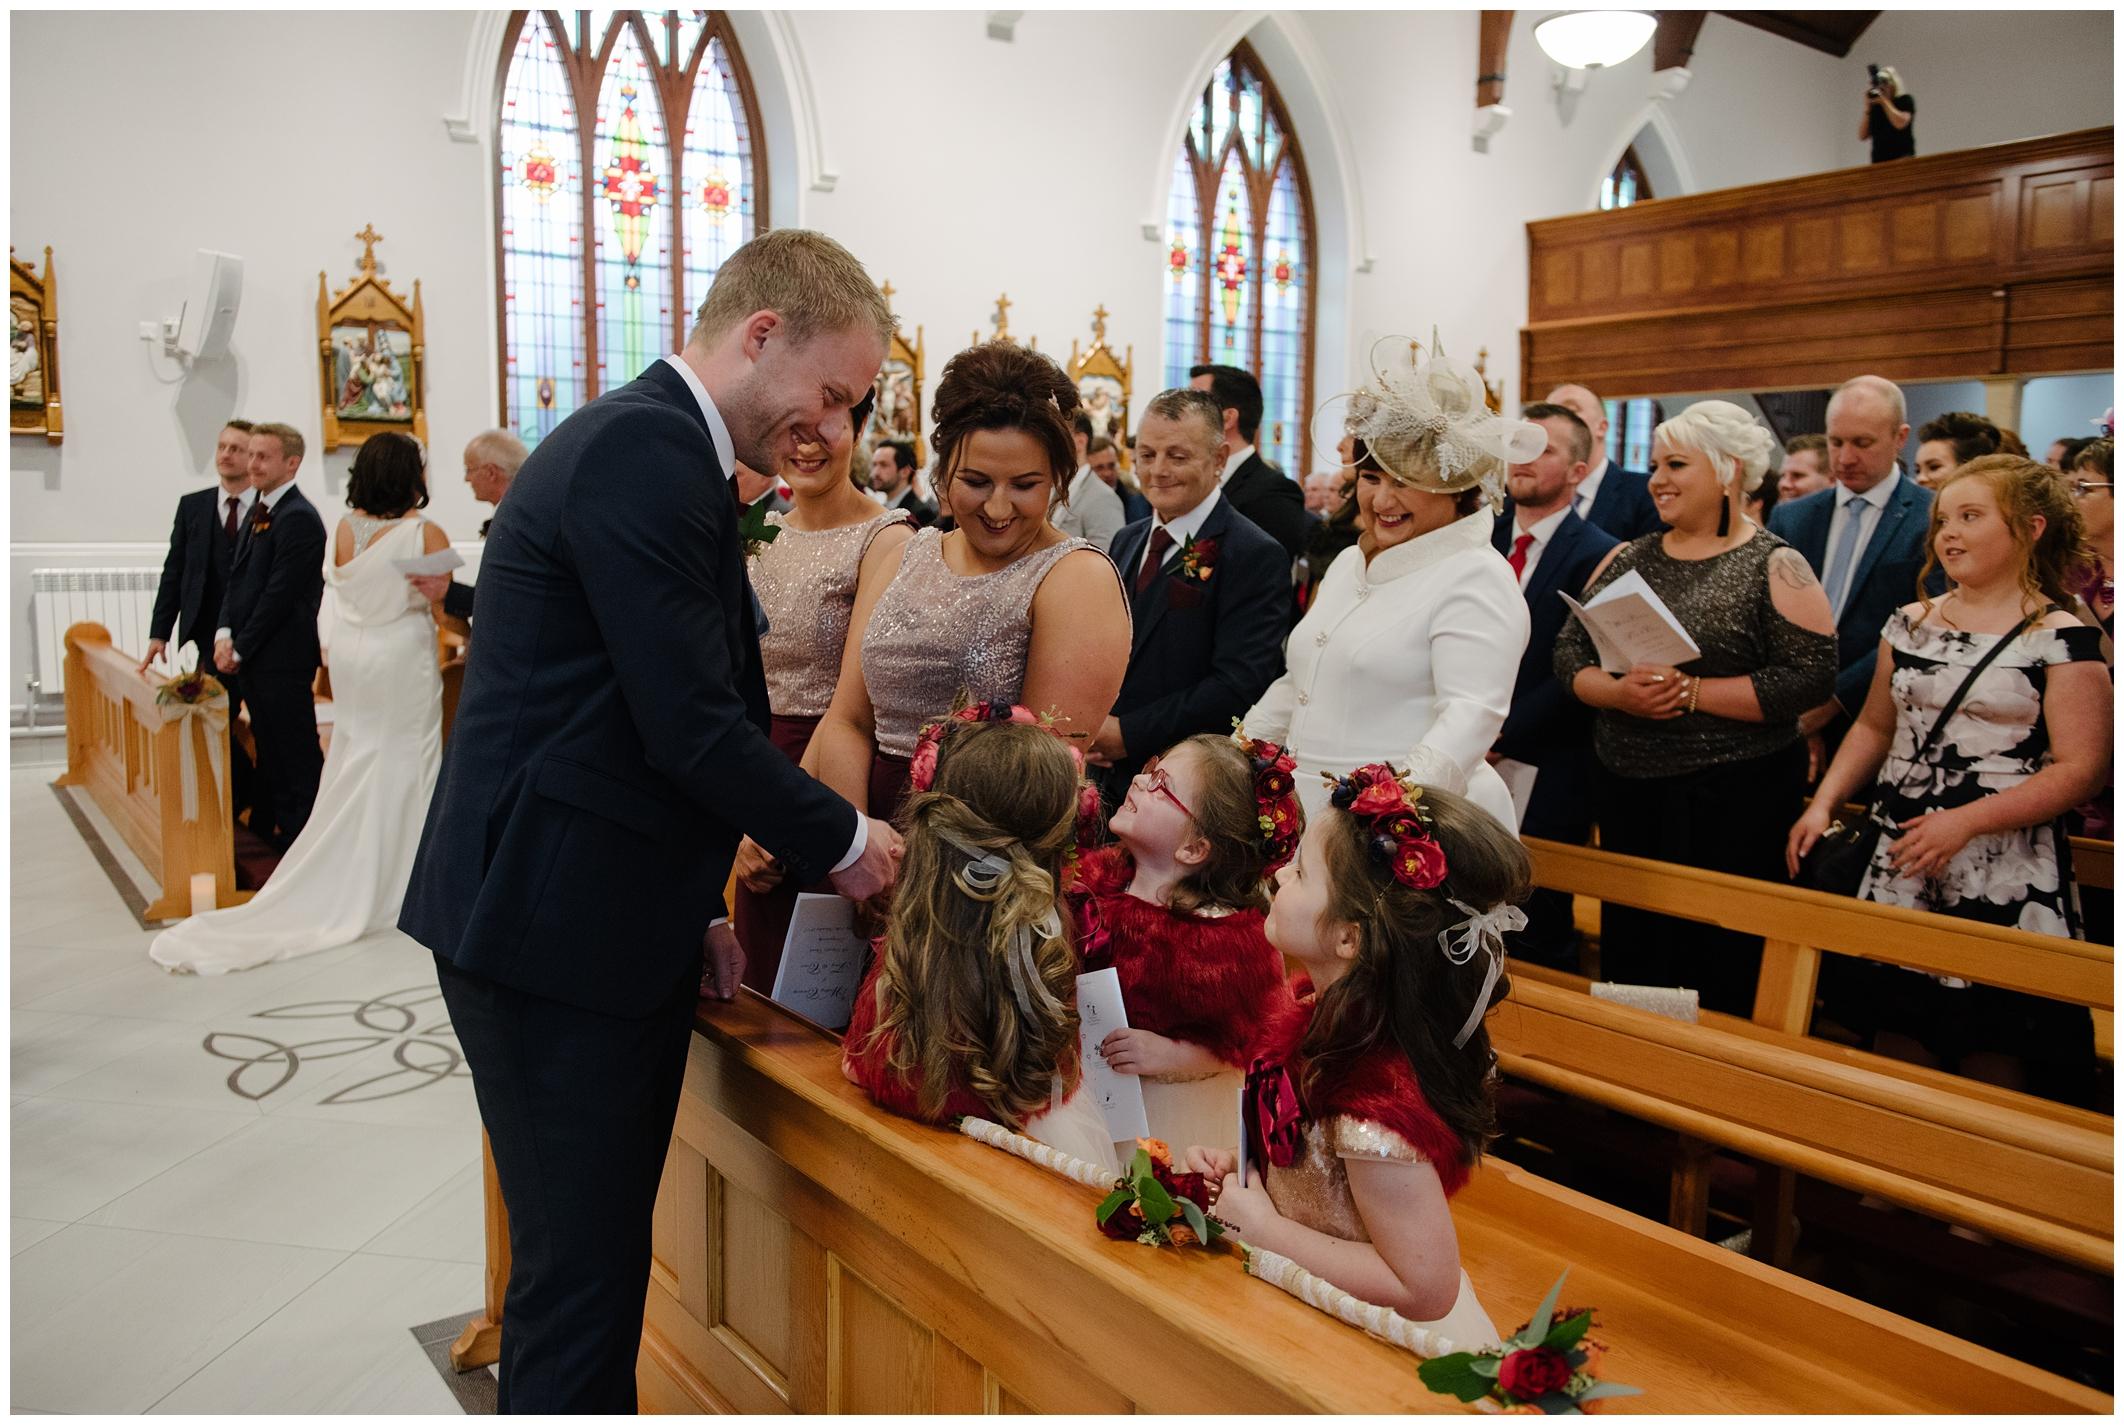 tracey_conor__wedding_jude_browne_photography_0032.jpg